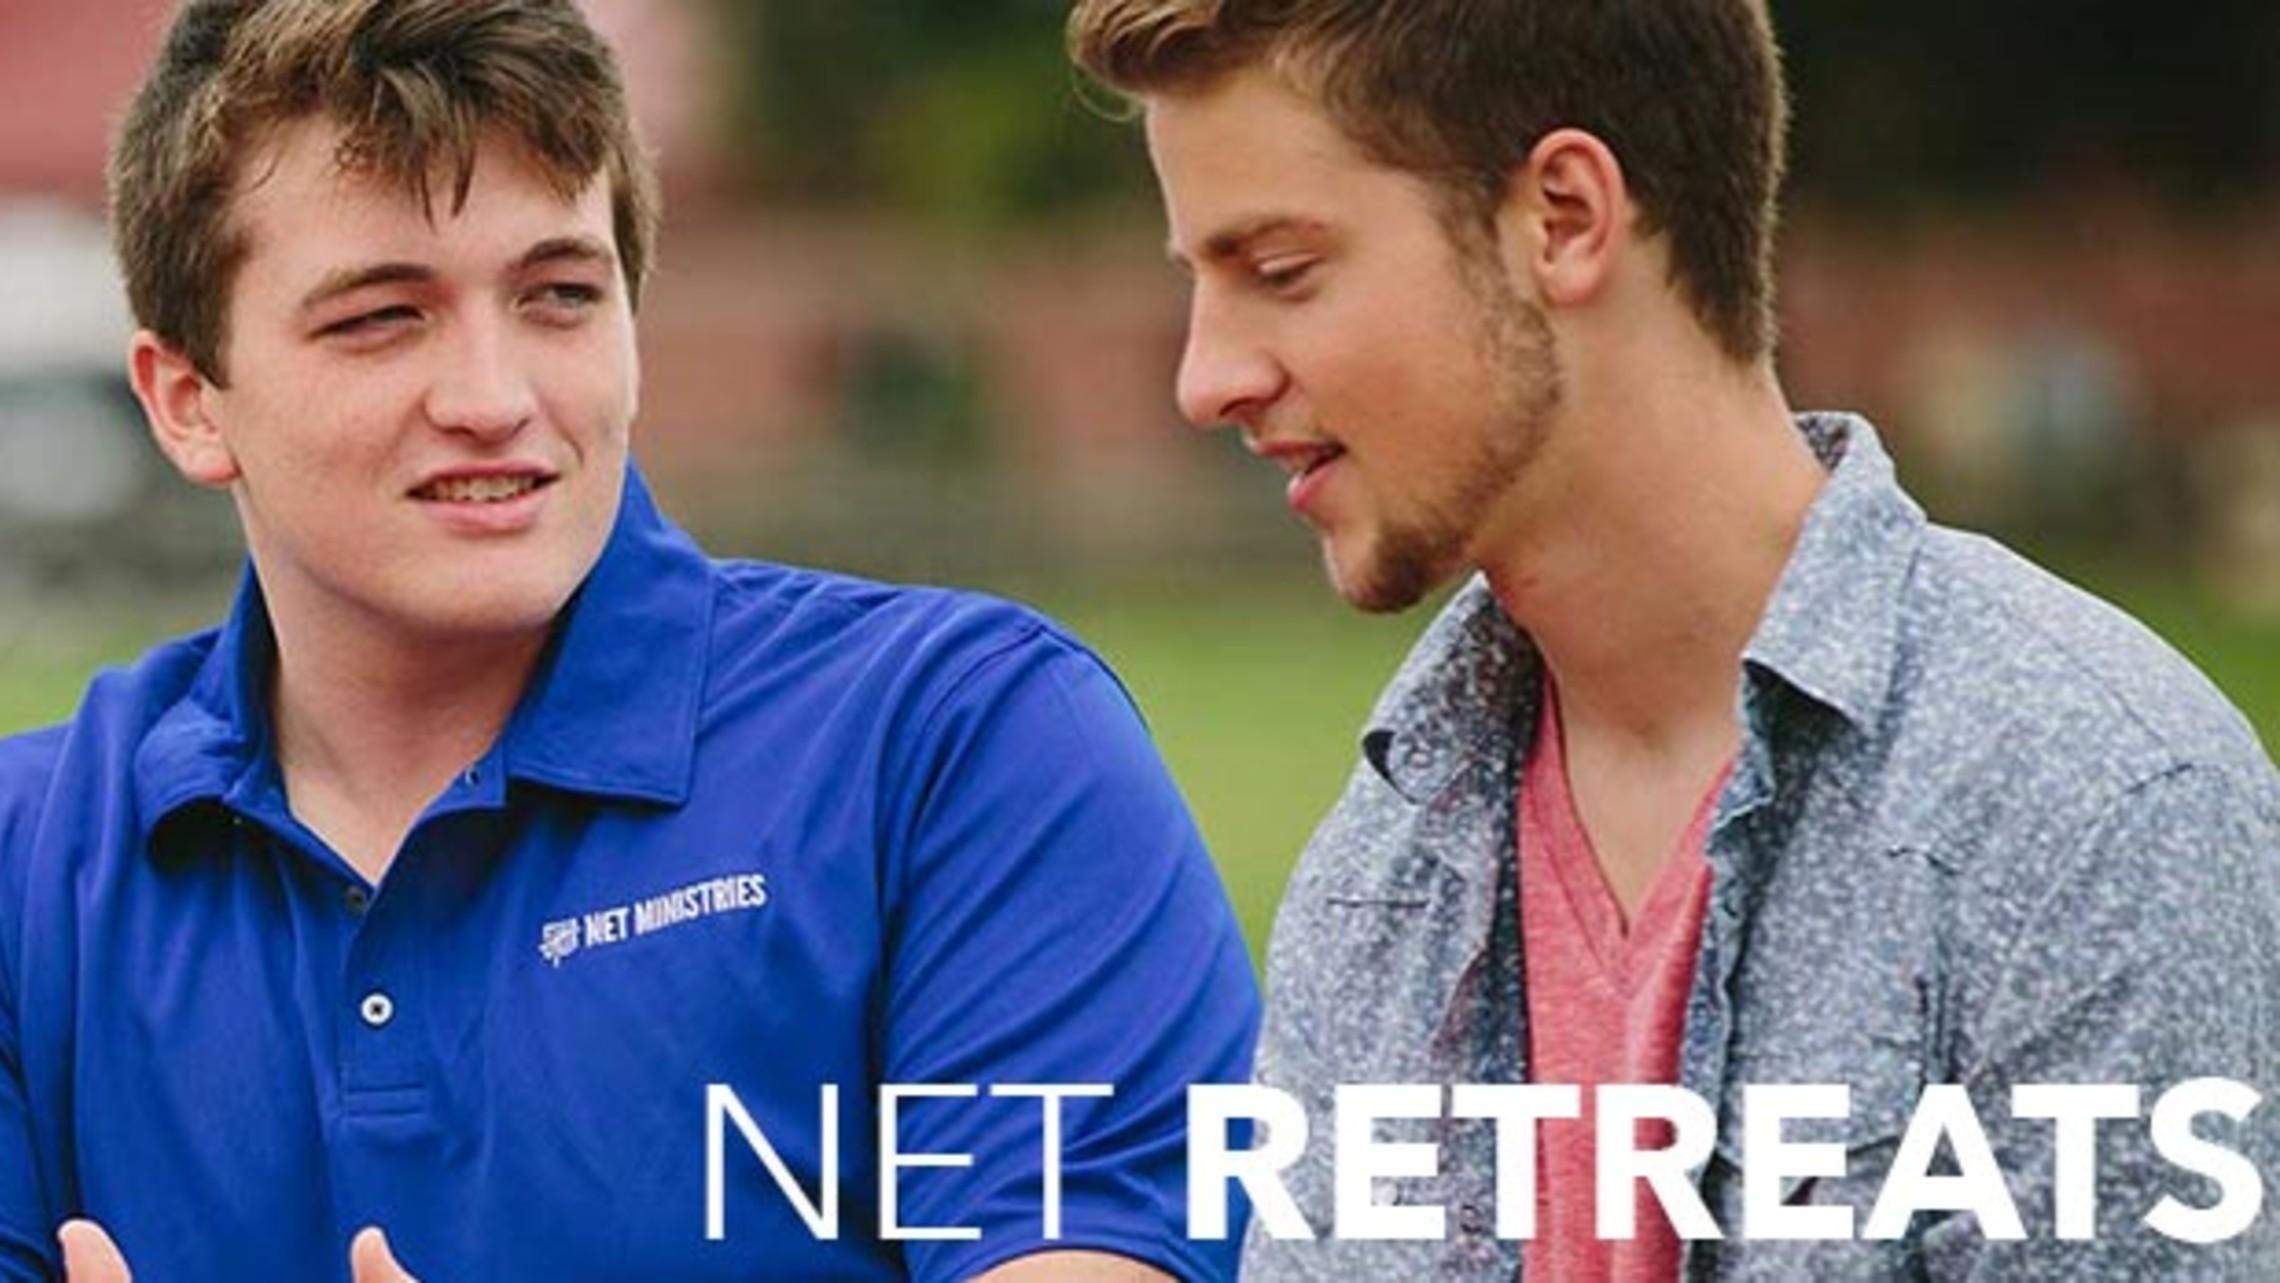 Net Netretreats